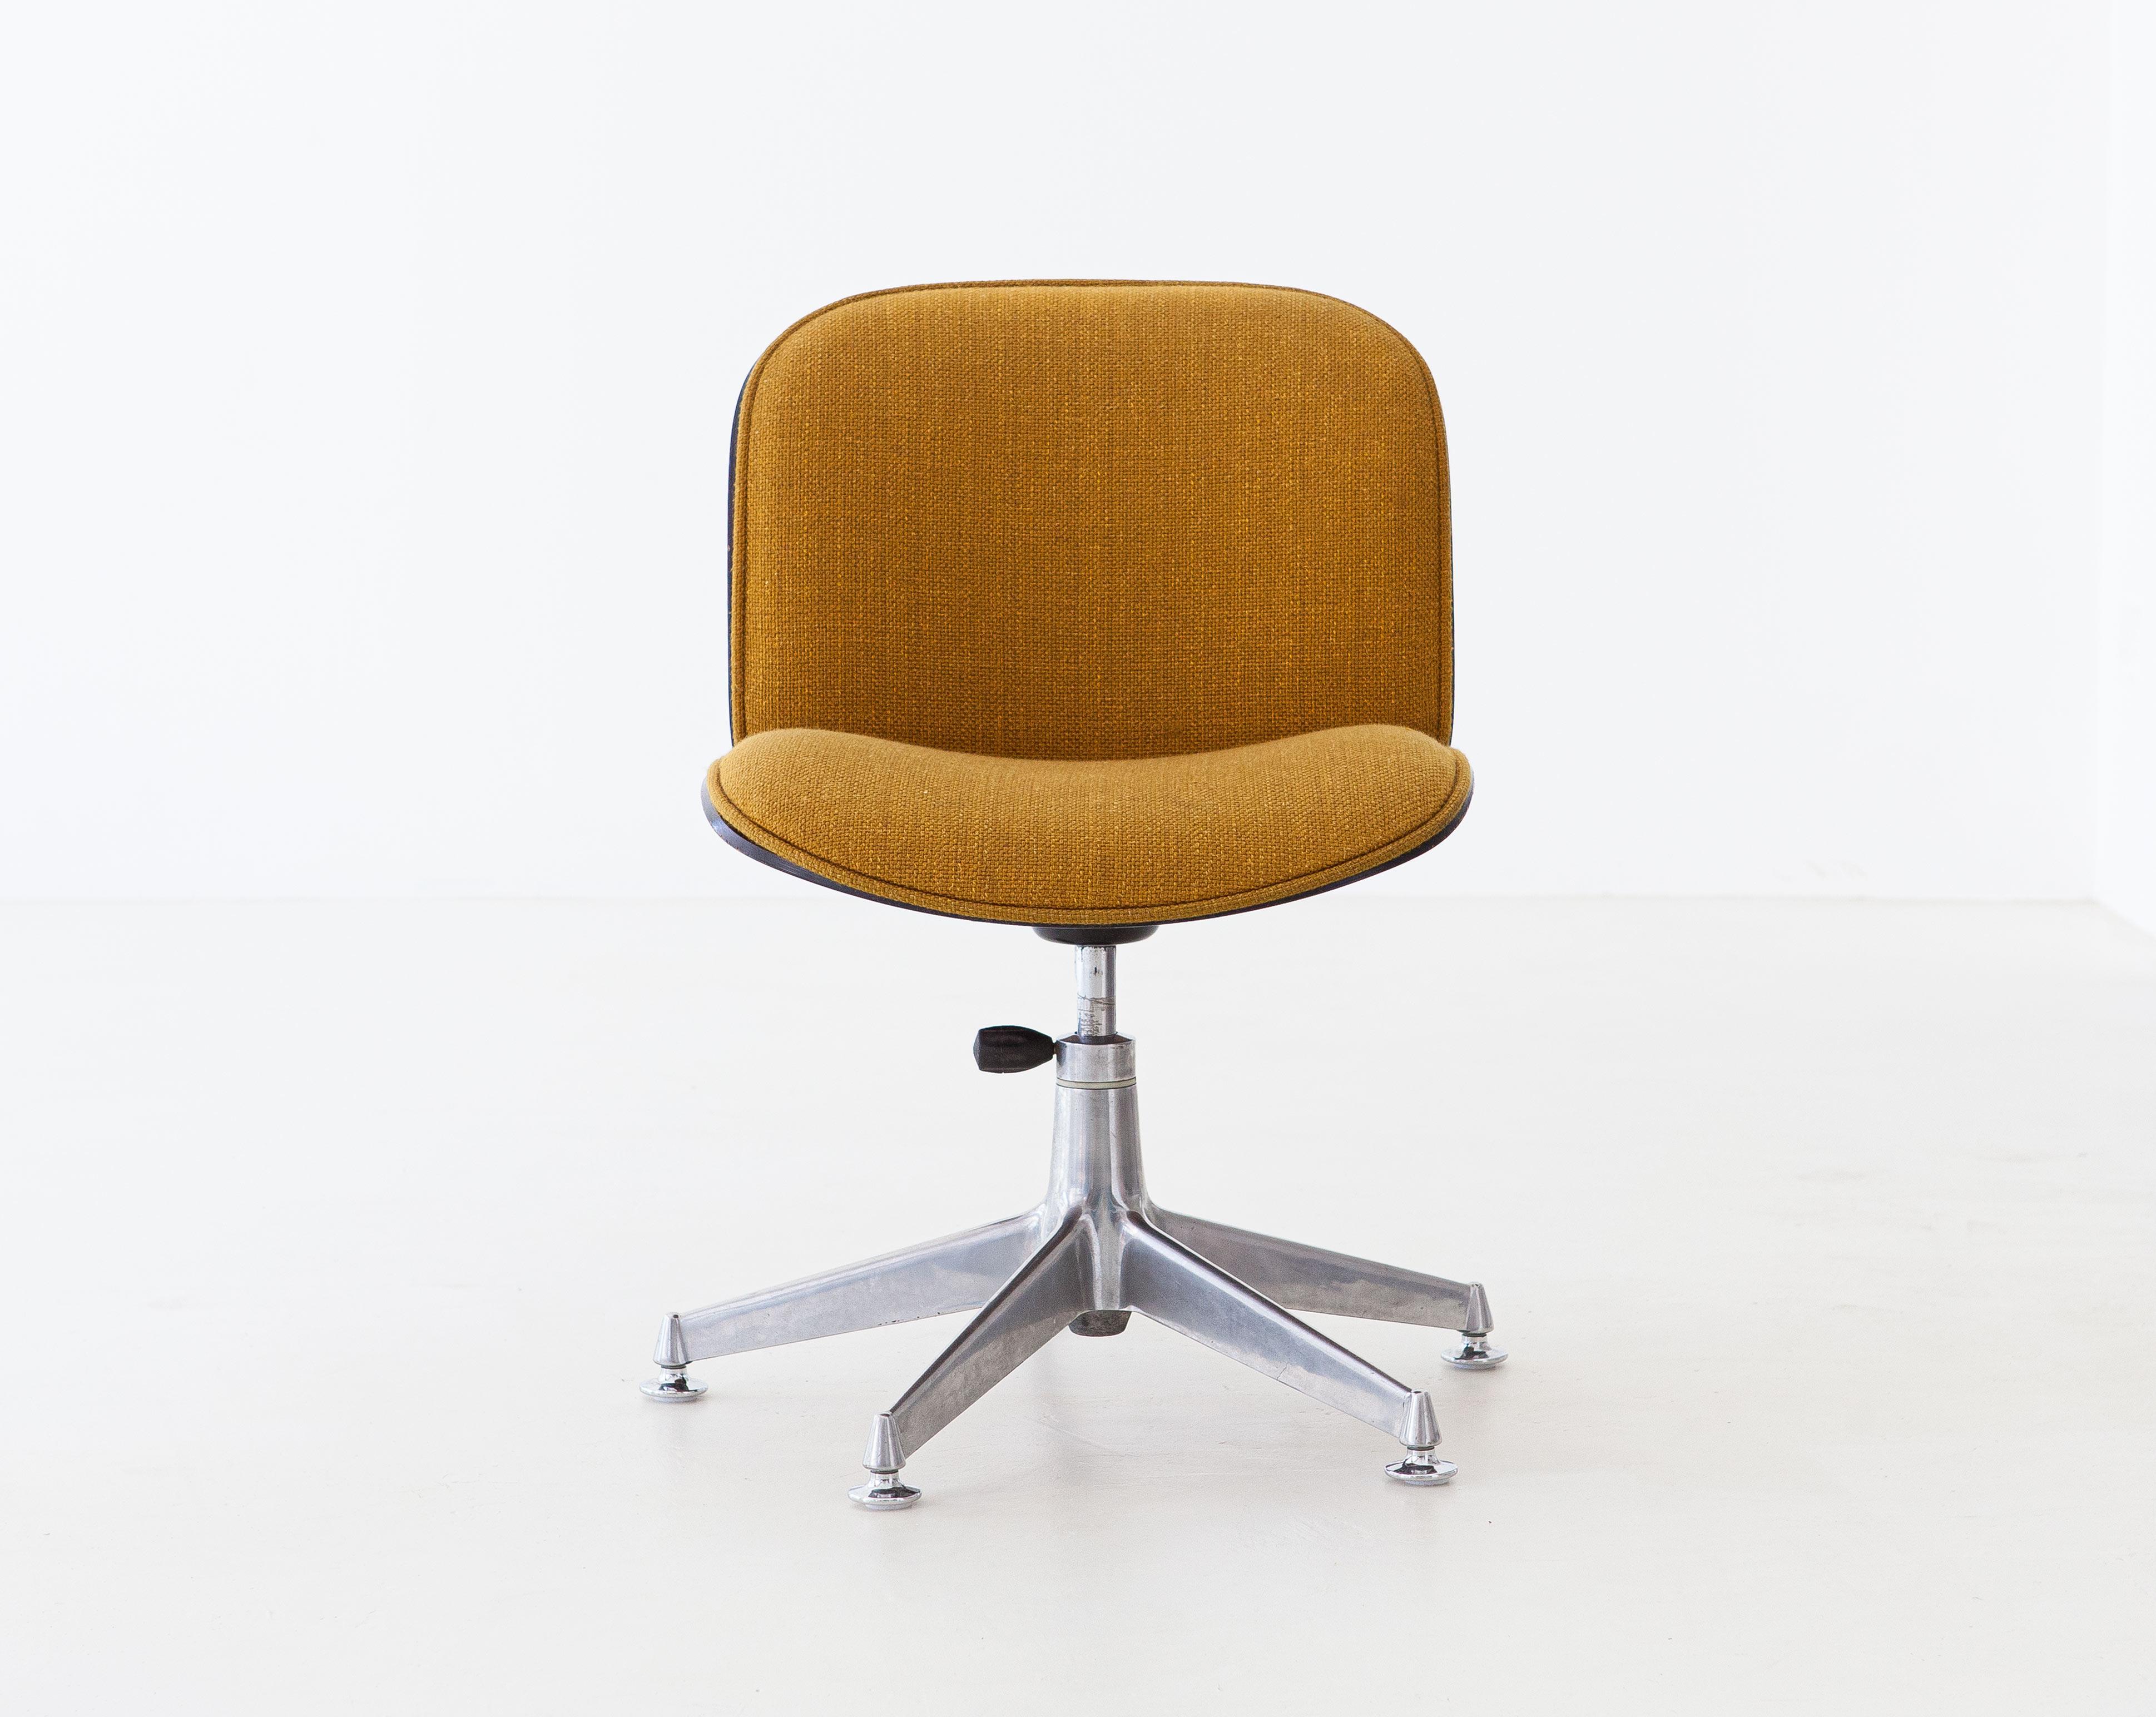 1950s-ico-parisi-for-mim-walnut-swivel-desk-chairs-11-se305